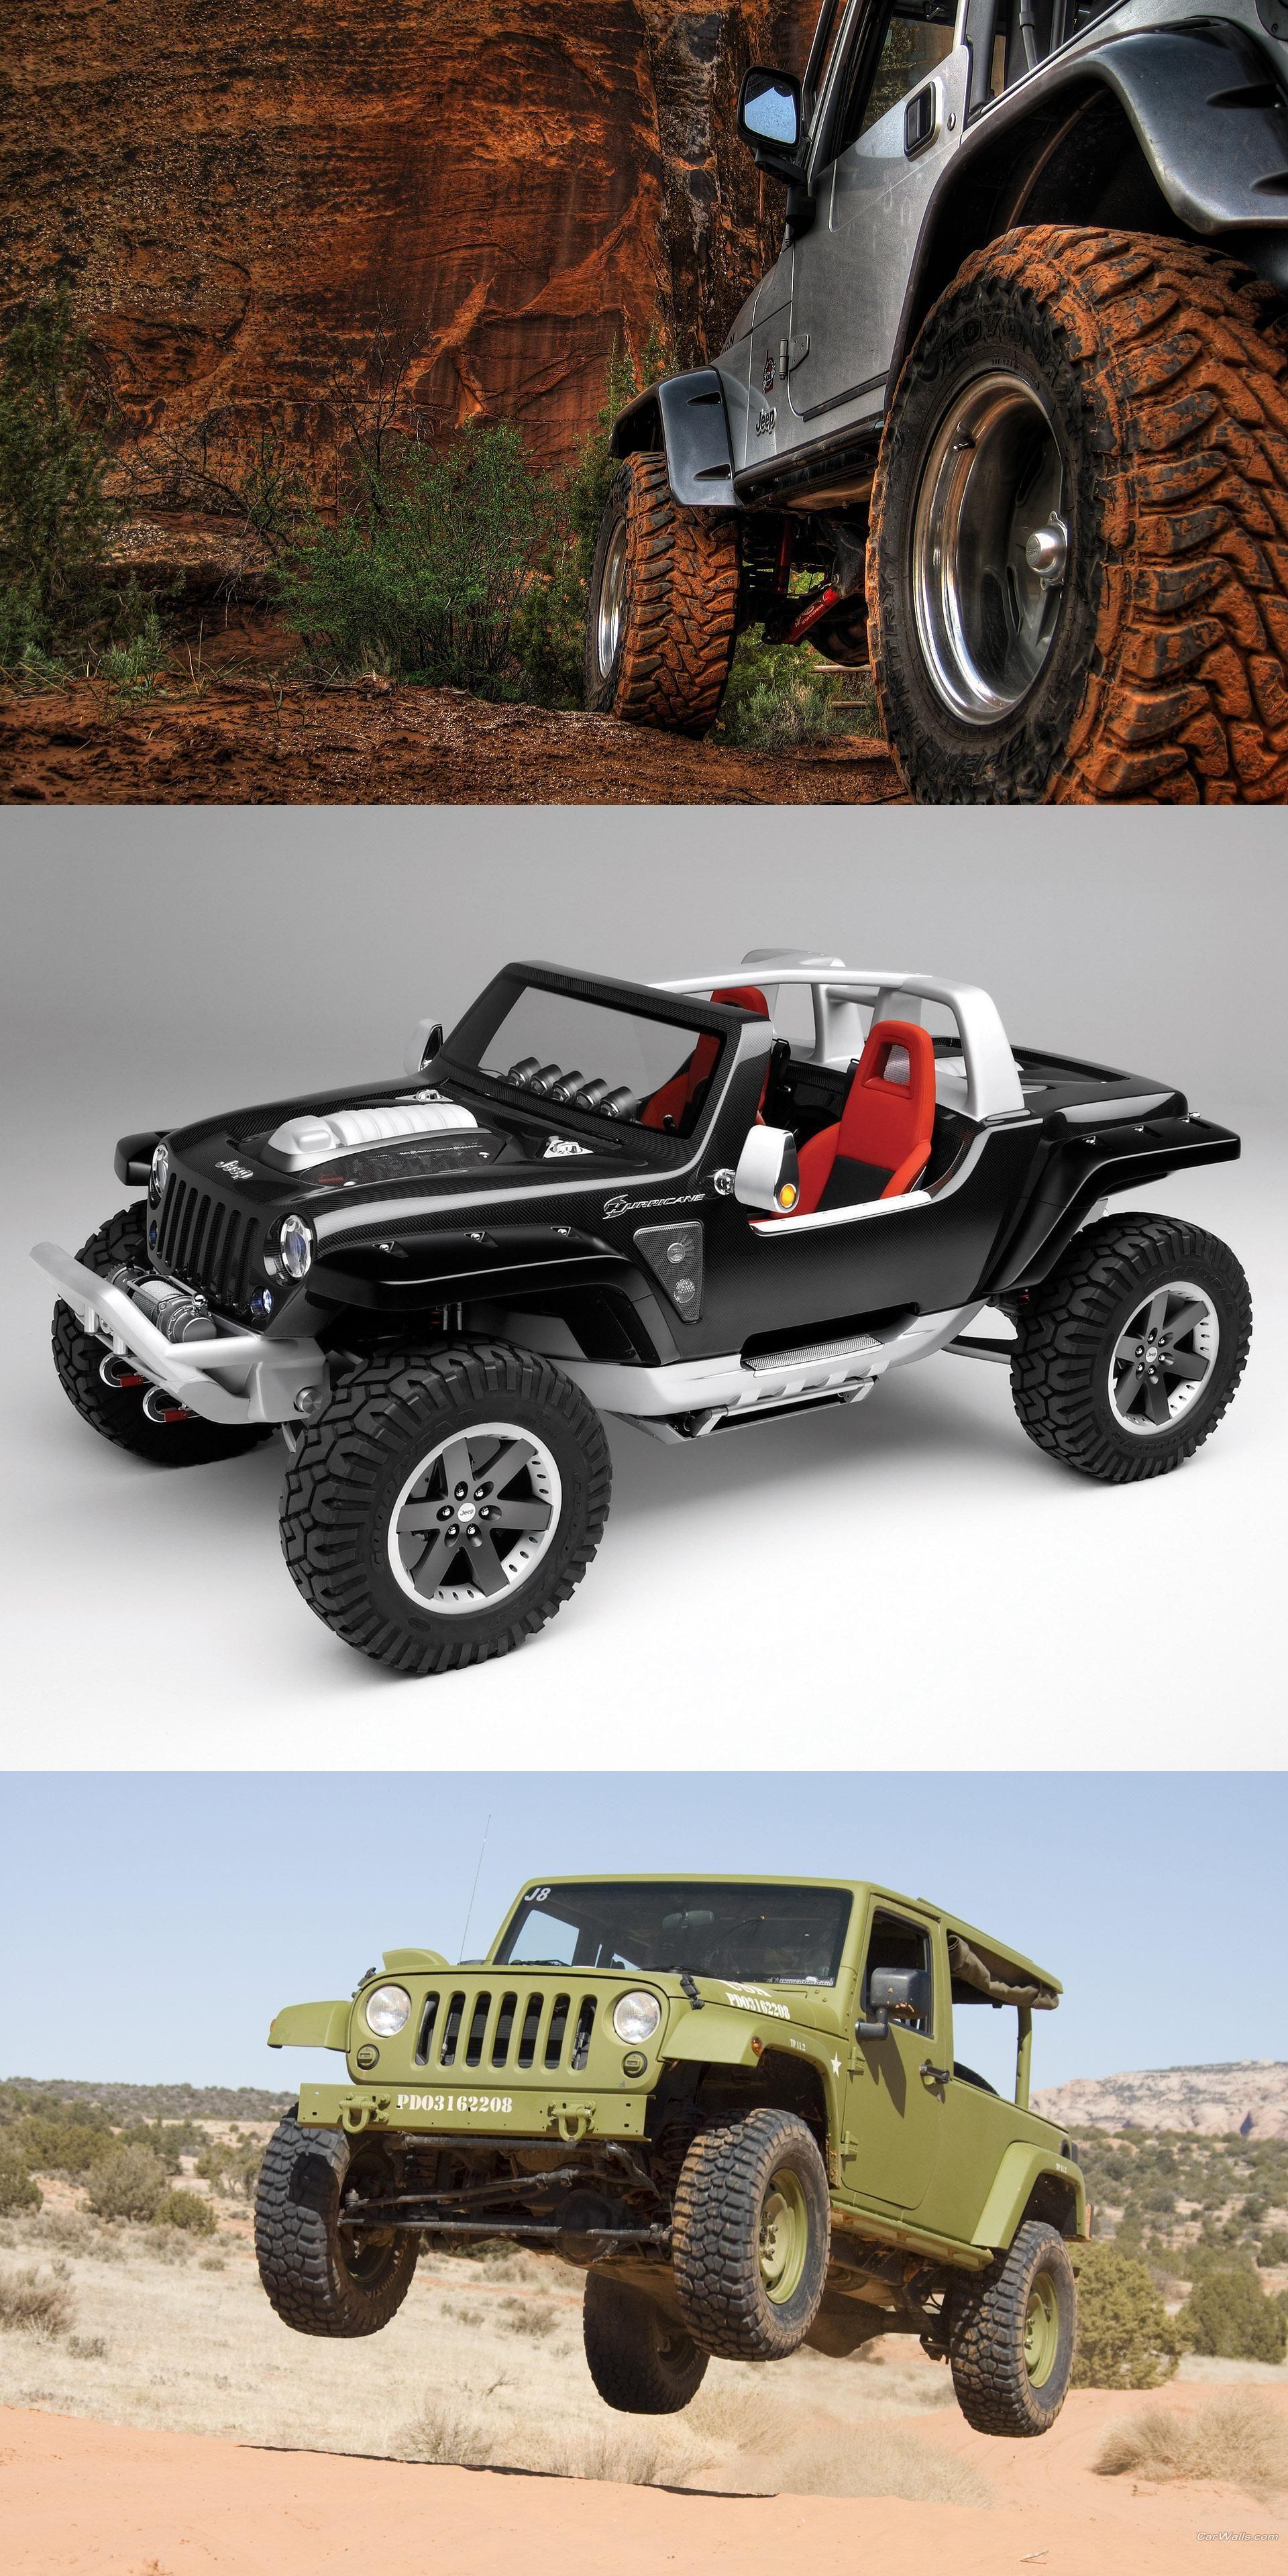 Offroad Jeep Cool Fun Jeep Concept Jeep Cars Jeep